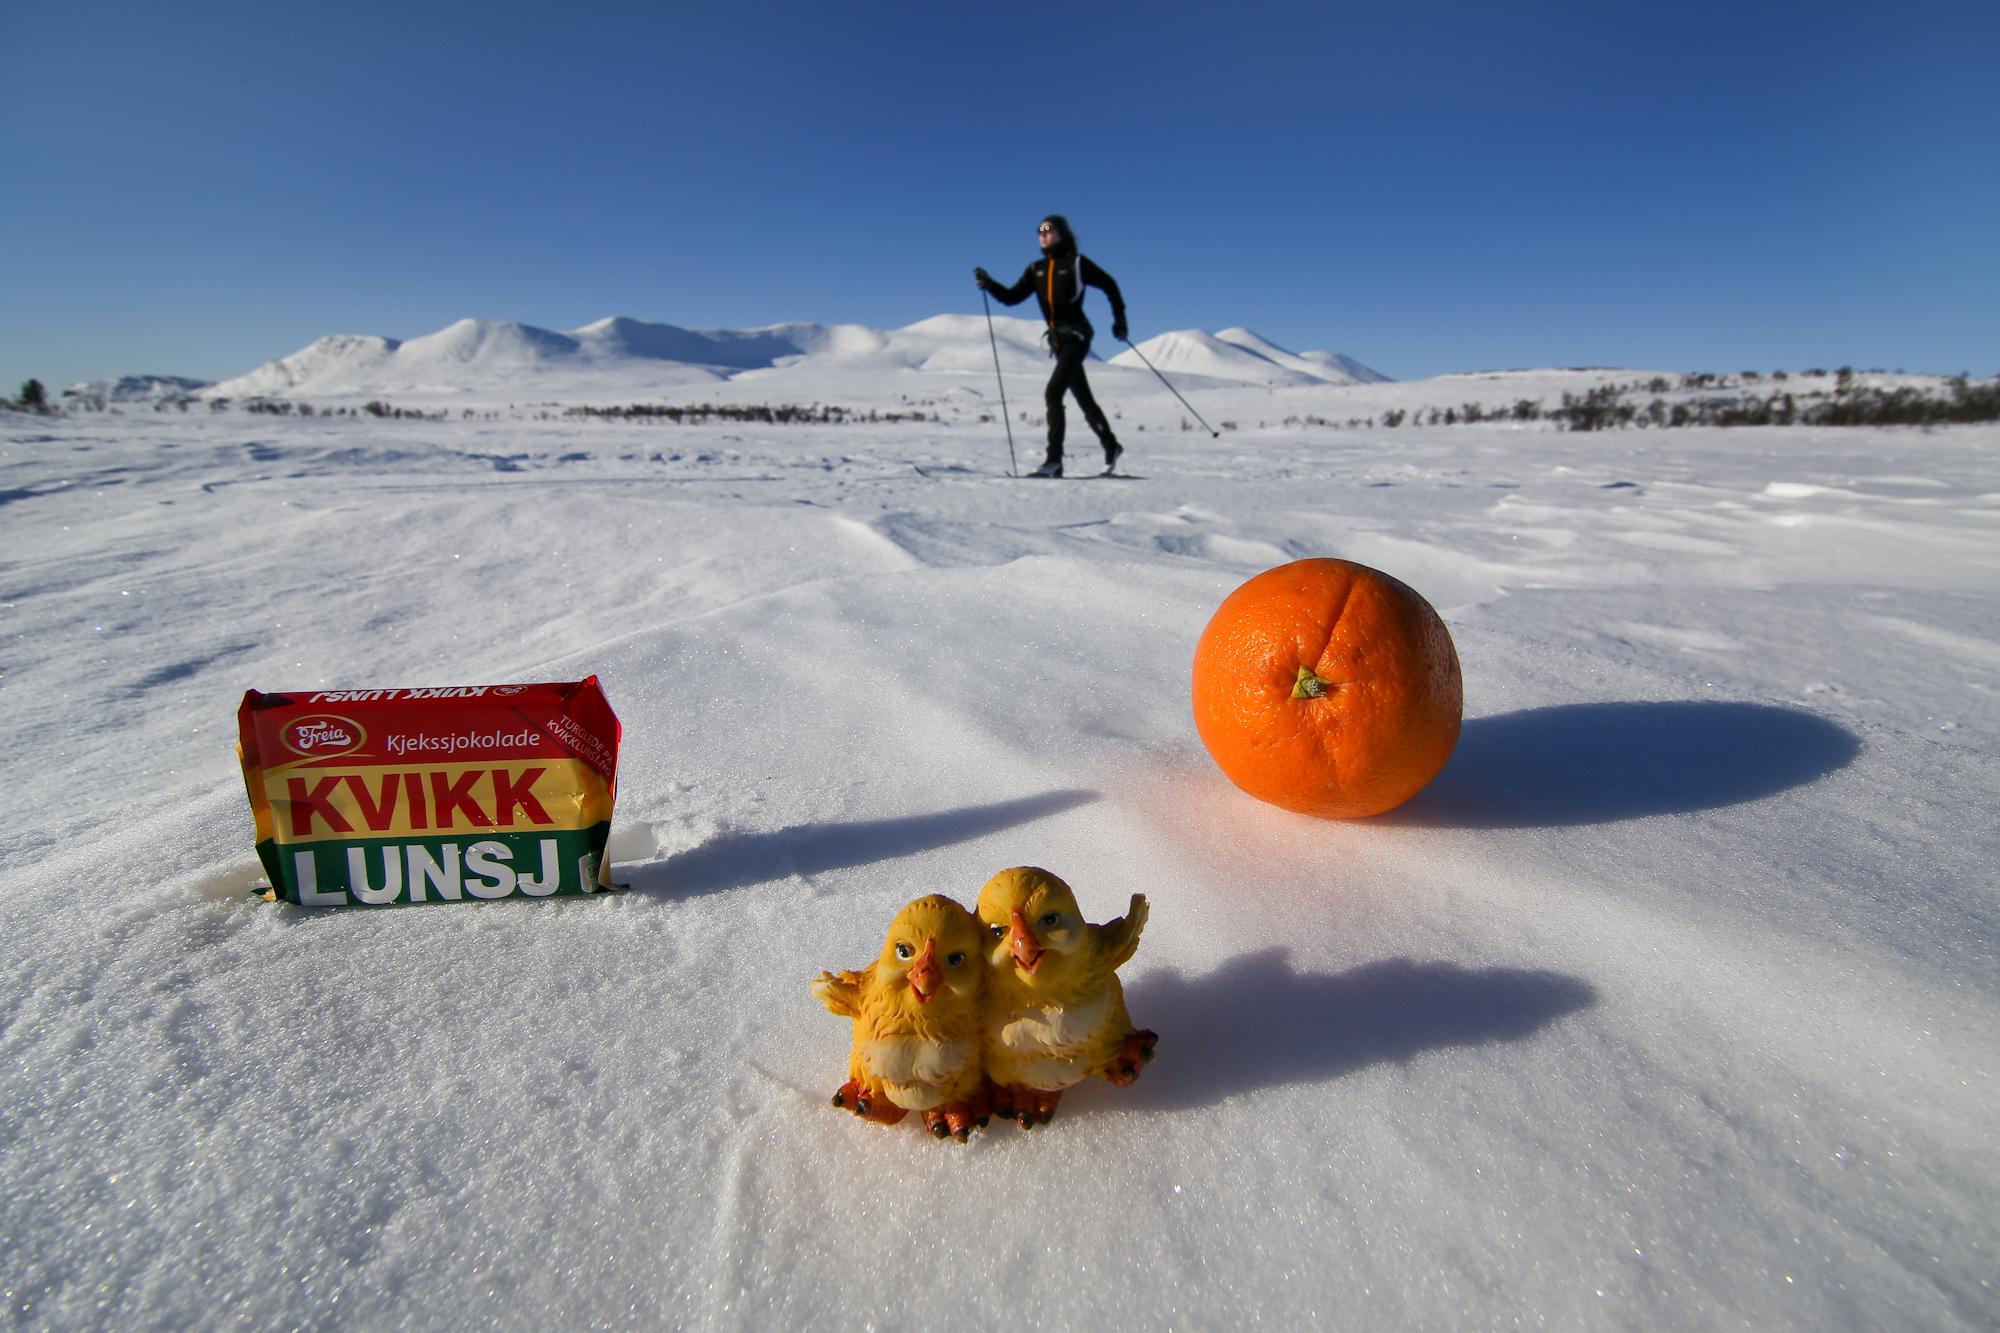 """Kvikklunsj"", pollitos de pascua y la naranja mandatoria para disfrutar la temporada"